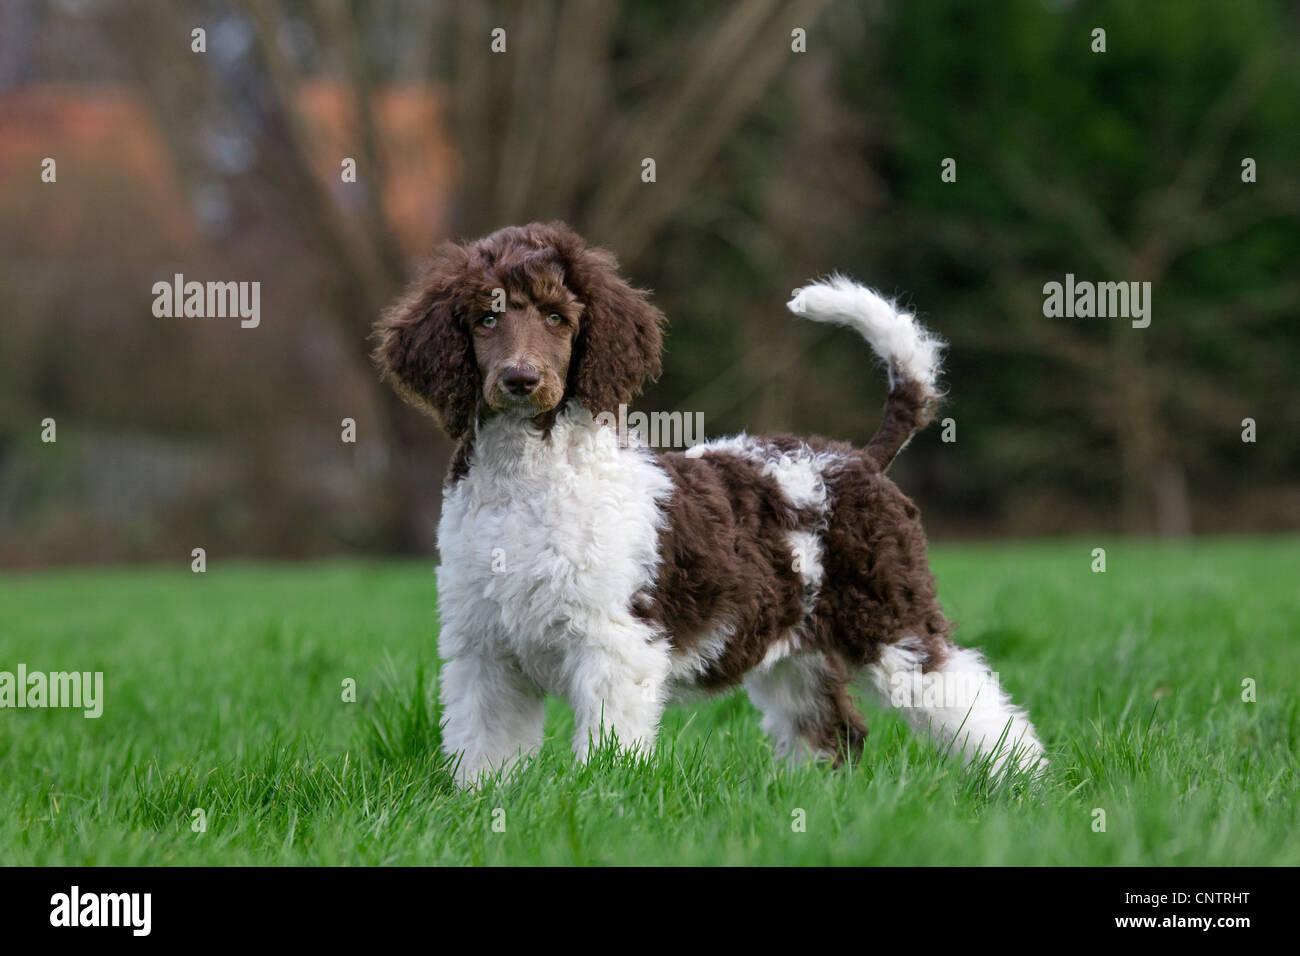 Harlequin poodle (Canis lupus familiaris), pup in garden - Stock Image